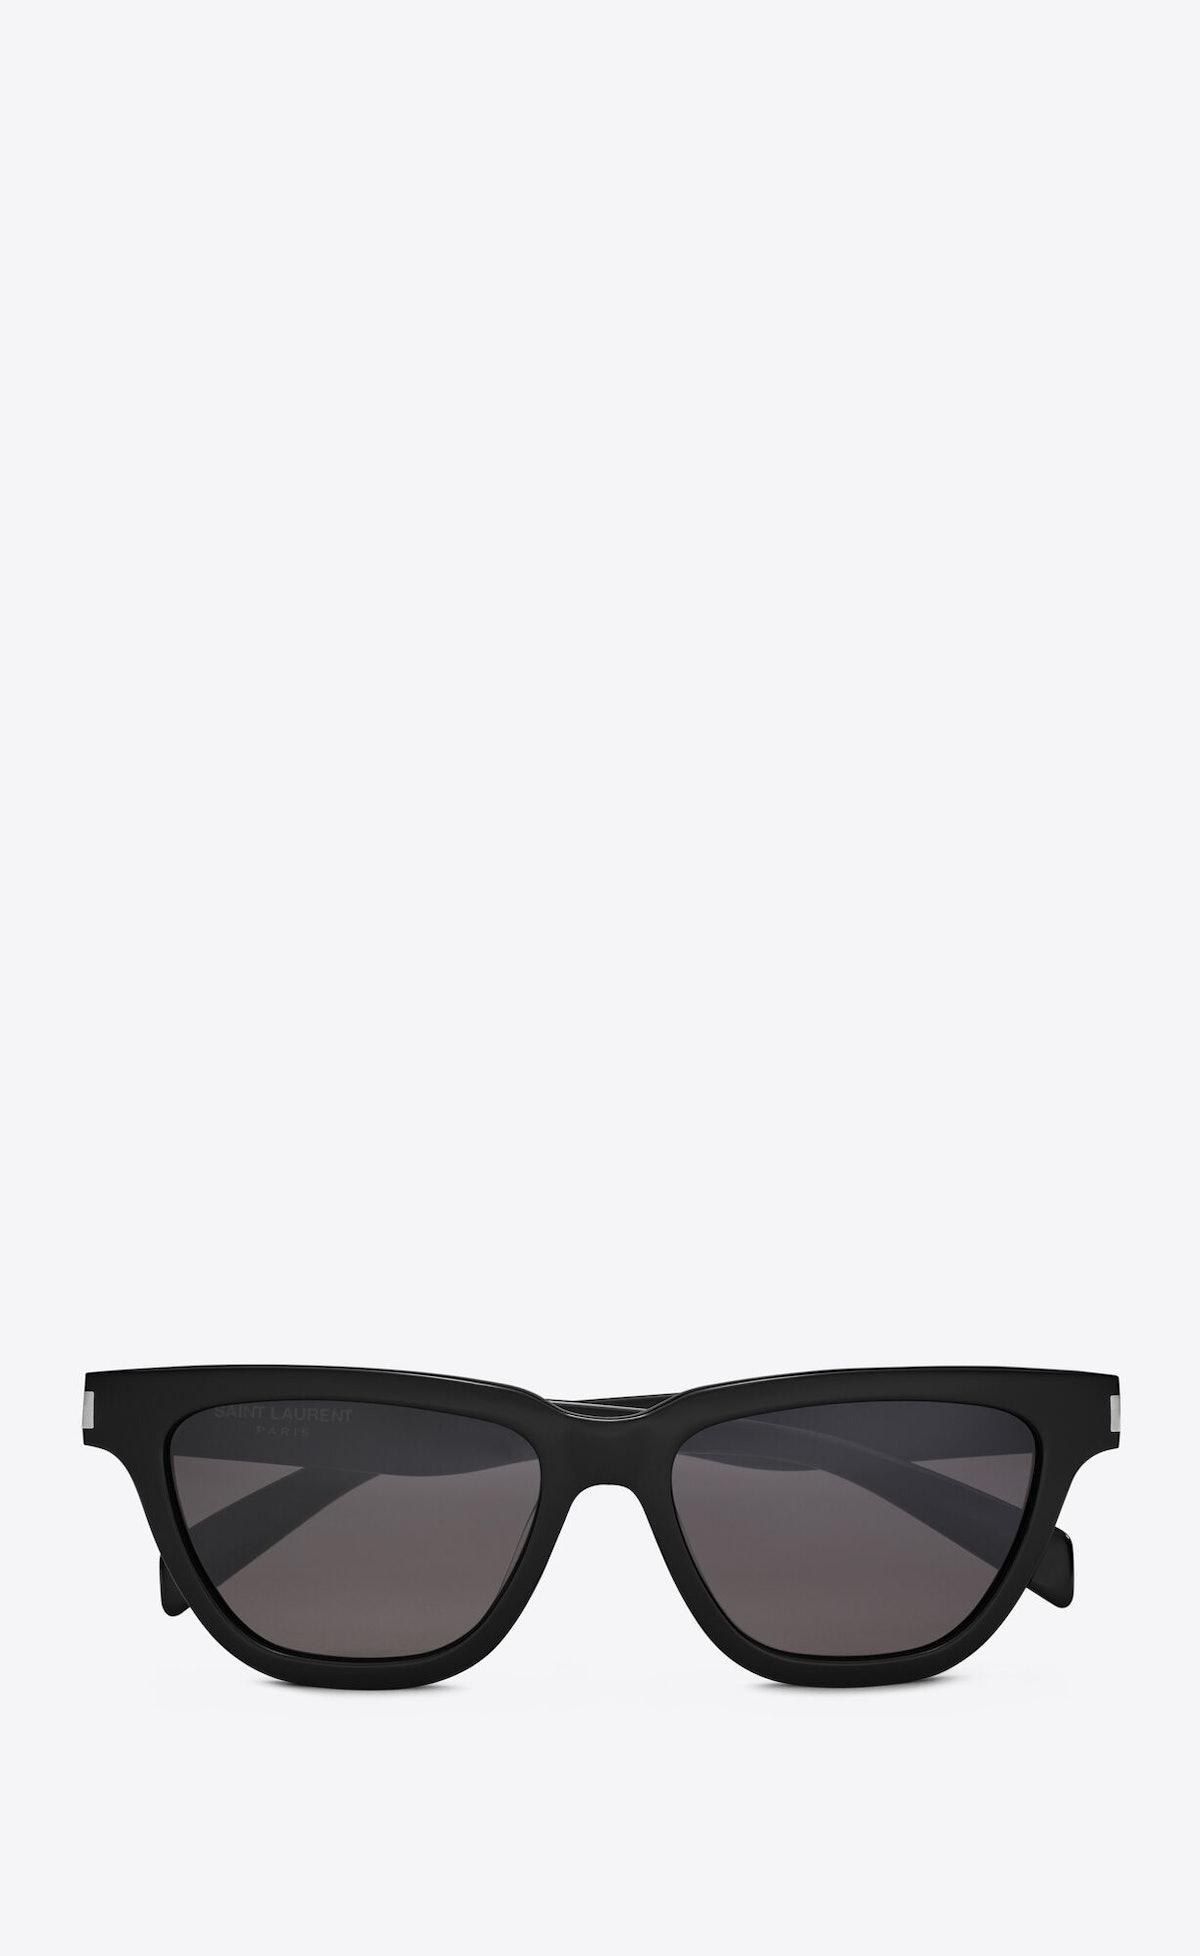 SL 462 sunglasses from Saint Laurent.